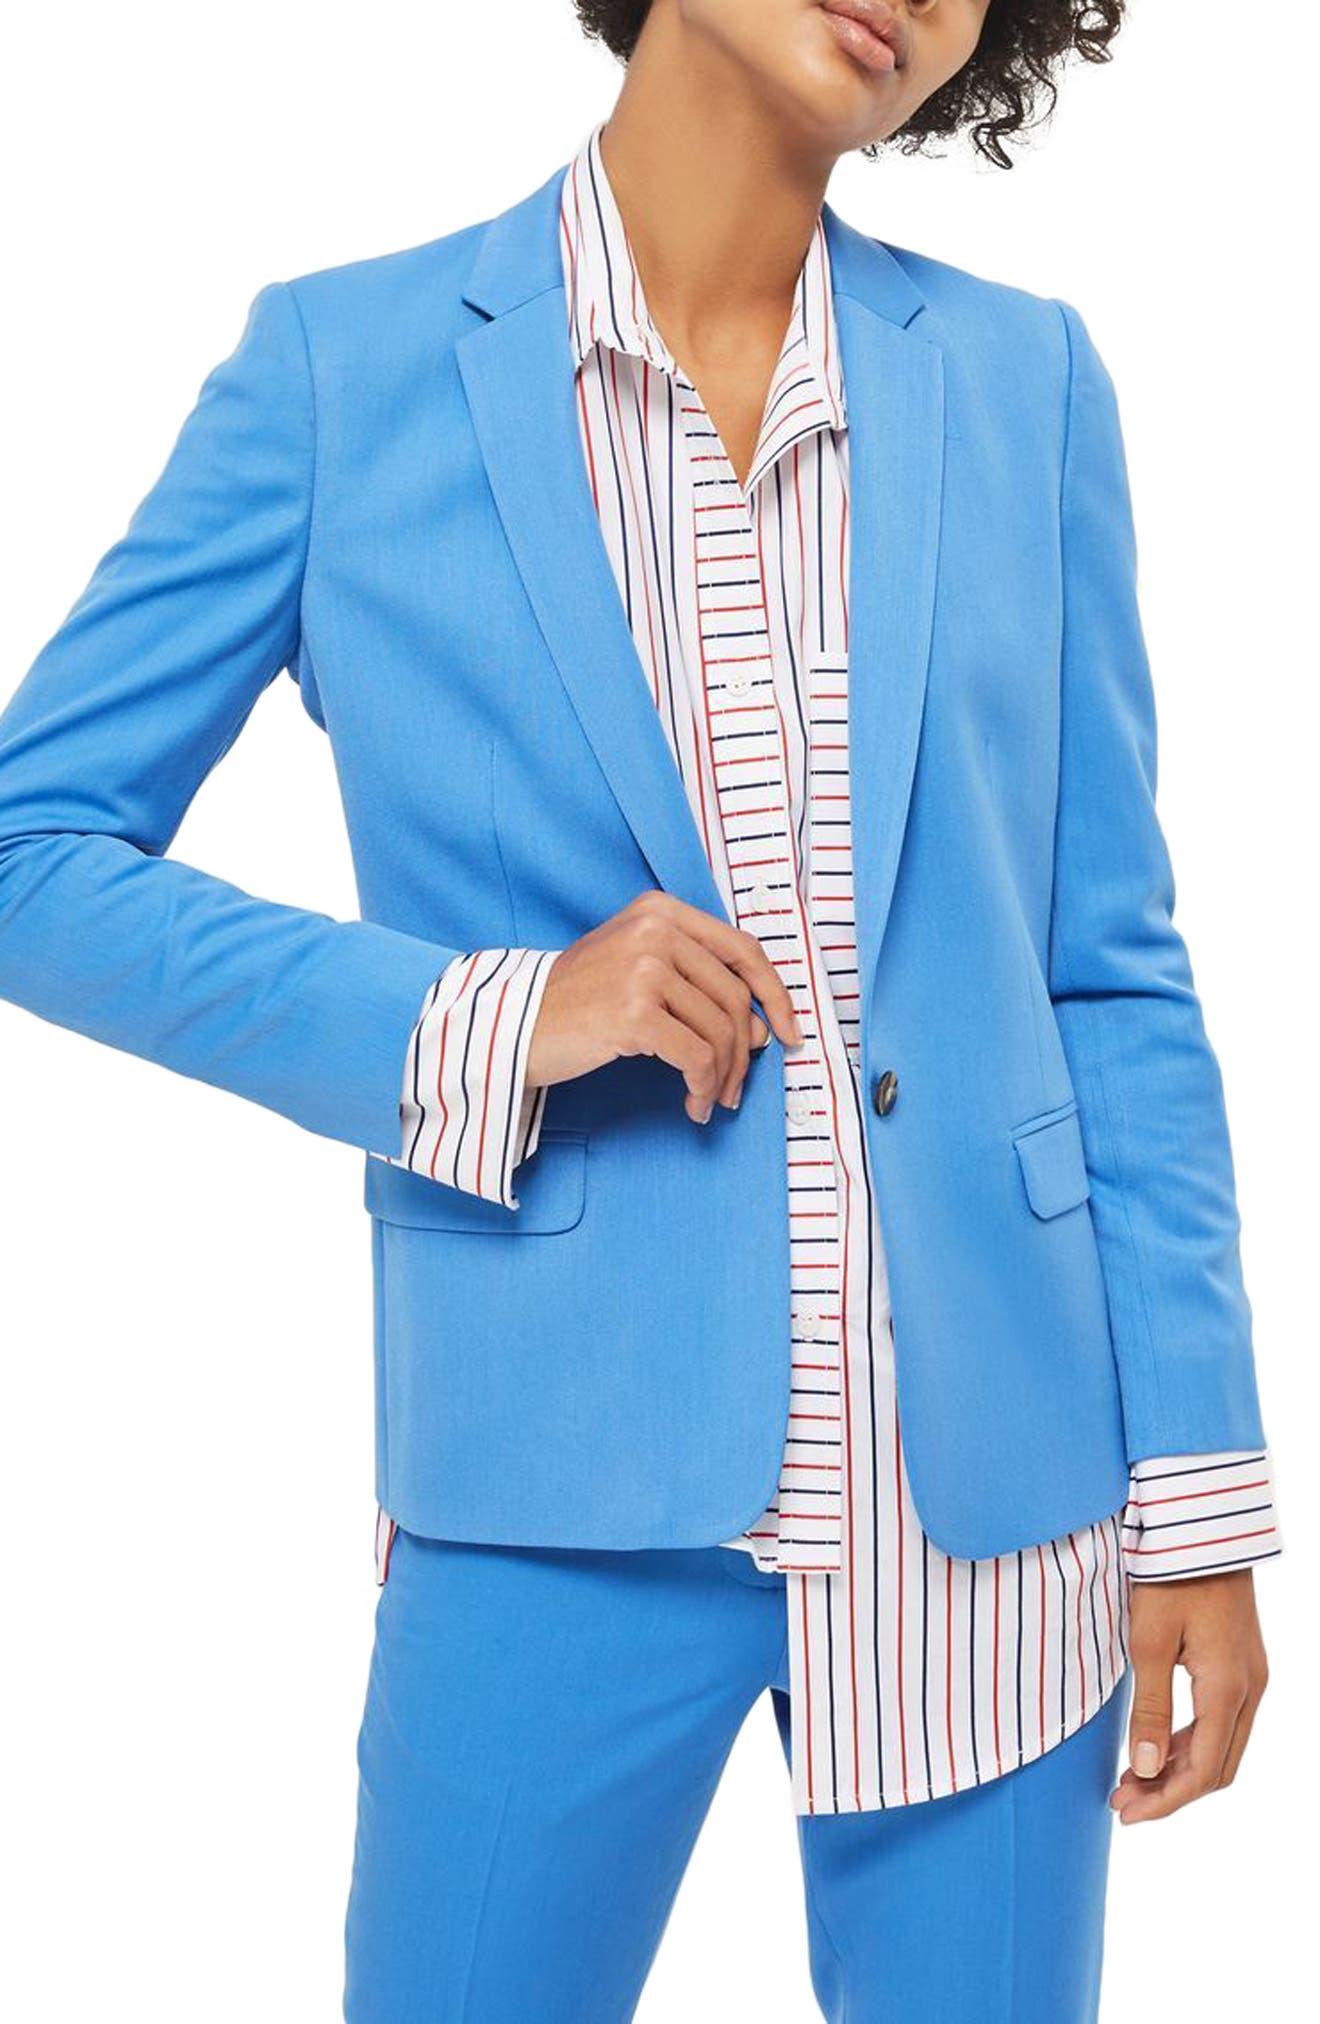 Topshop Tailored Suit Jacket (Regular & Petite)